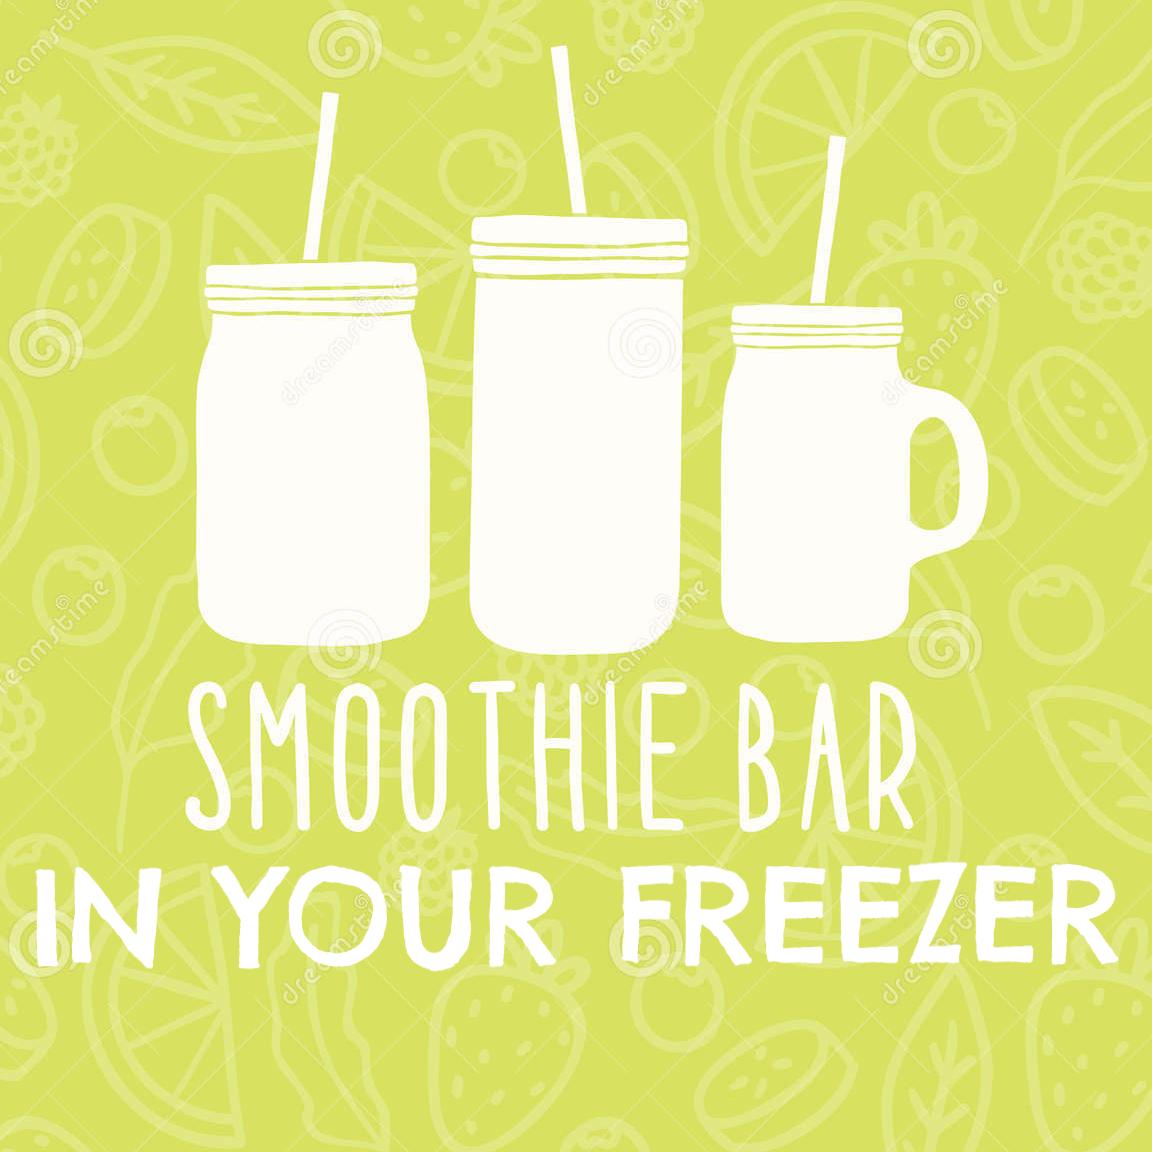 smoothie-bar-logo-different-mason-jars-vector-illustration-56554692_edited